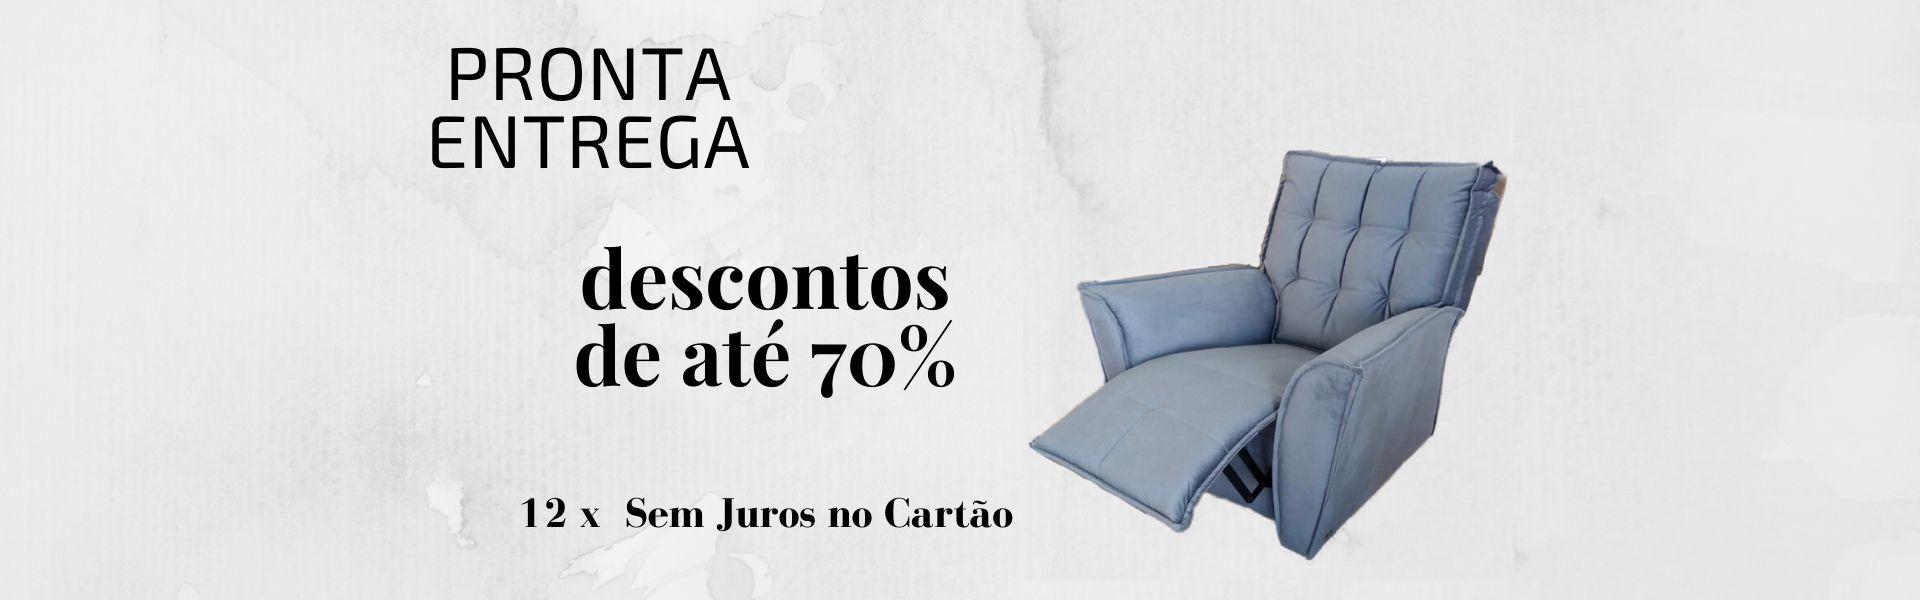 Pronta Entrega 70%